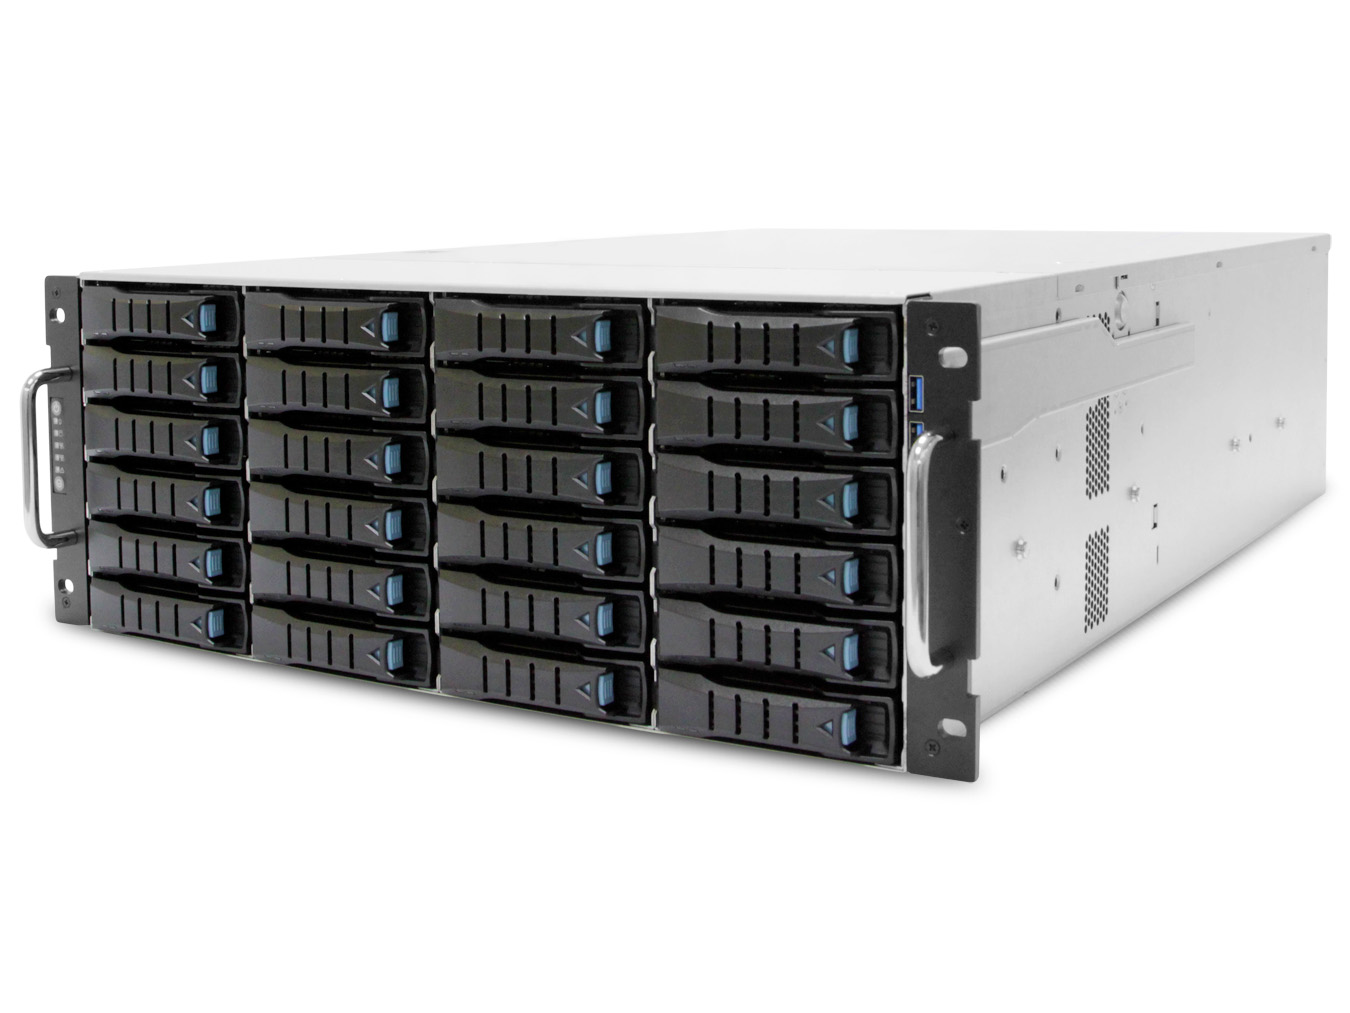 AIC SB402-VG XP1-S402VG01 4U 36-Bay Storage Server